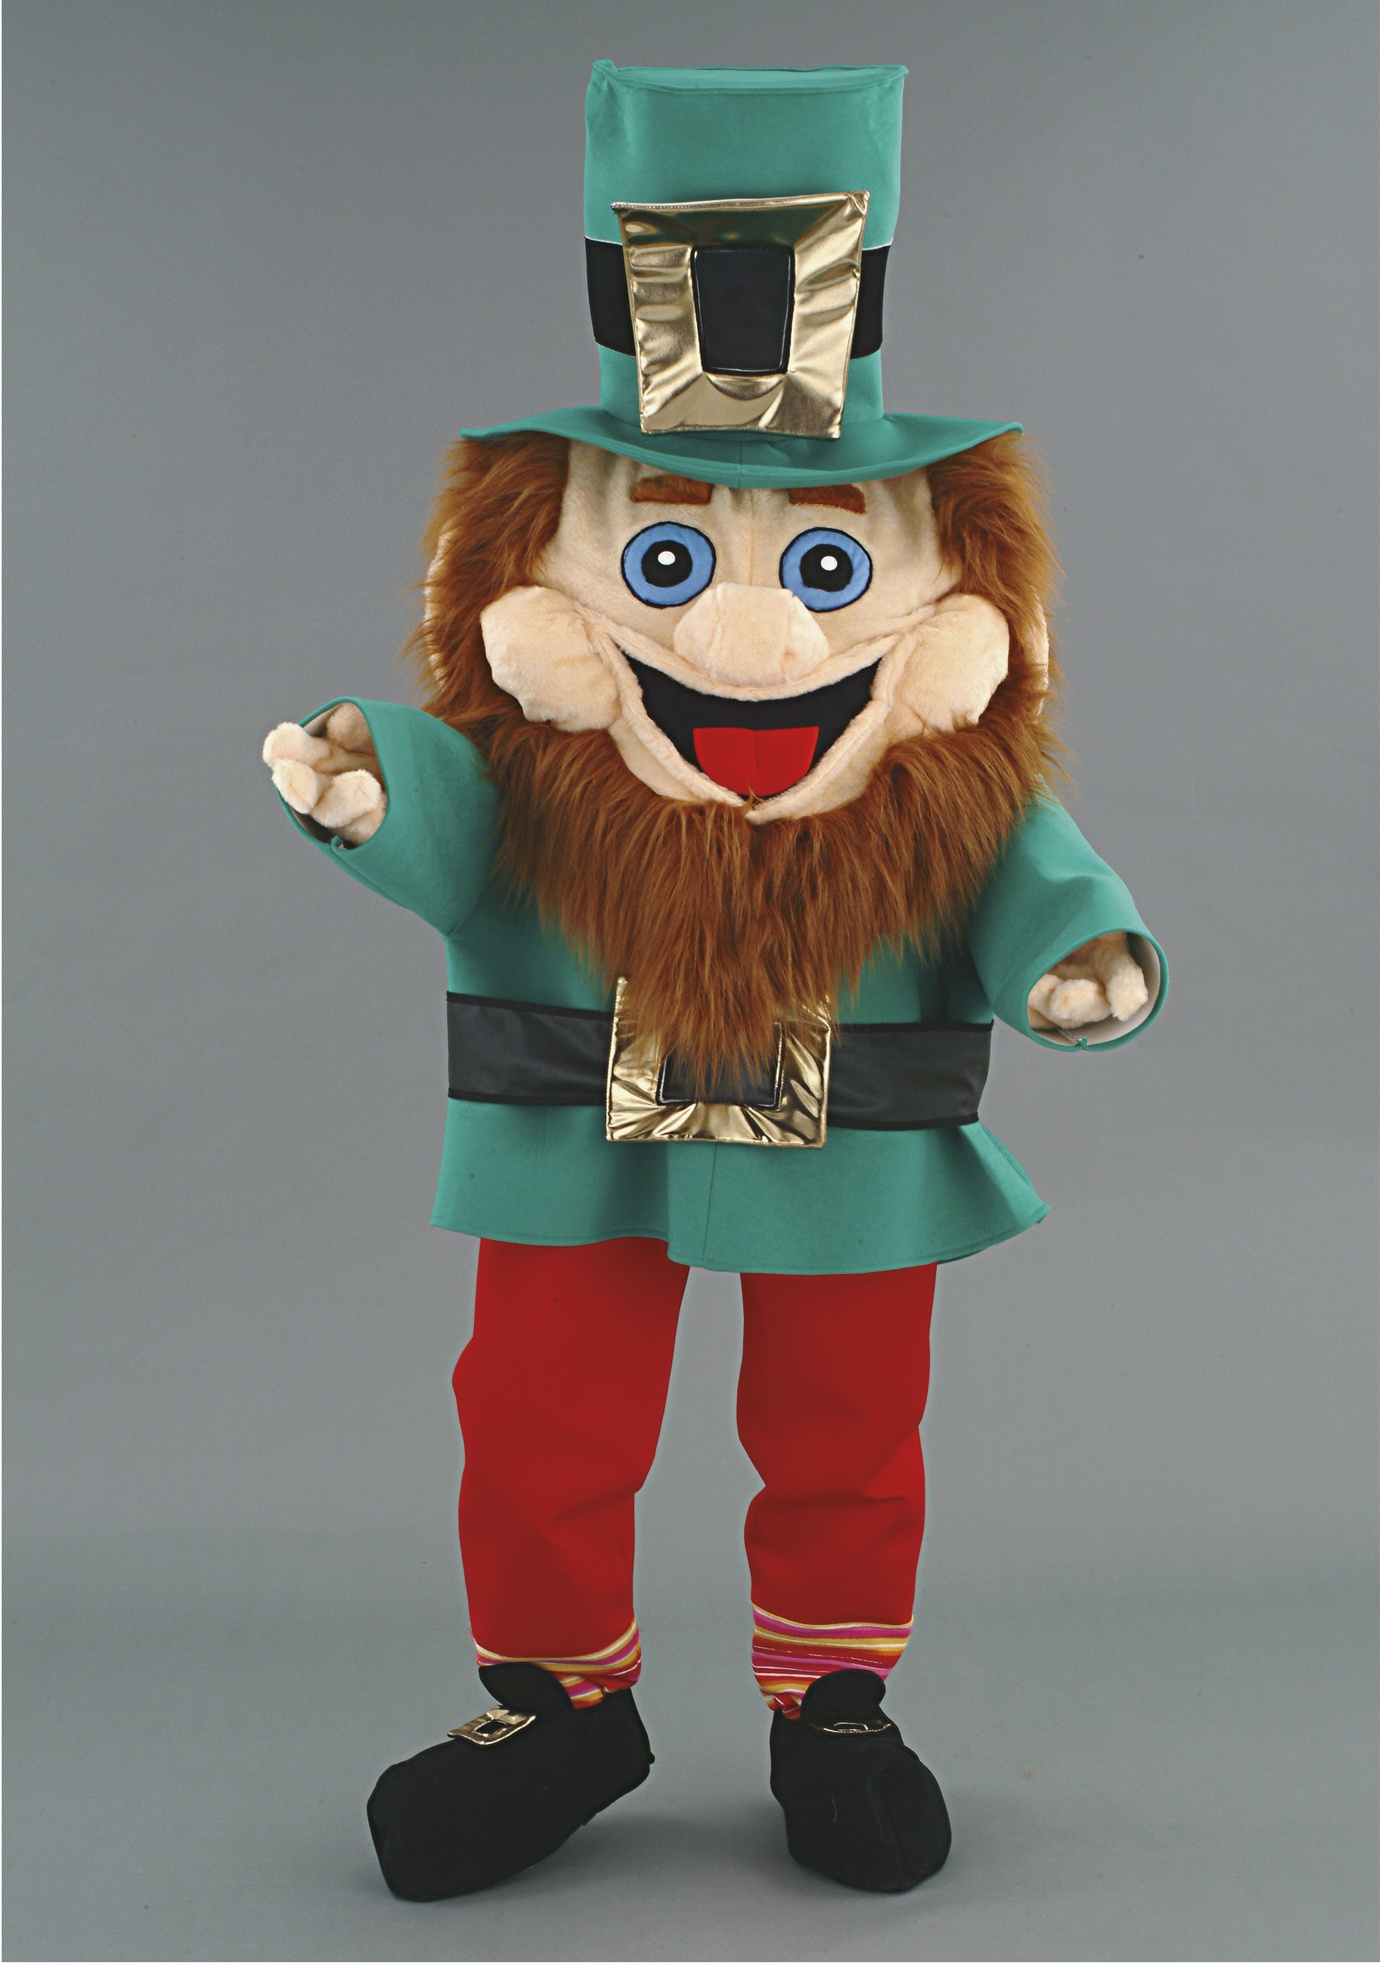 Kobold Troll Kostüm 100a Lauffigur Promotion Walking Act Figur Maskottchen